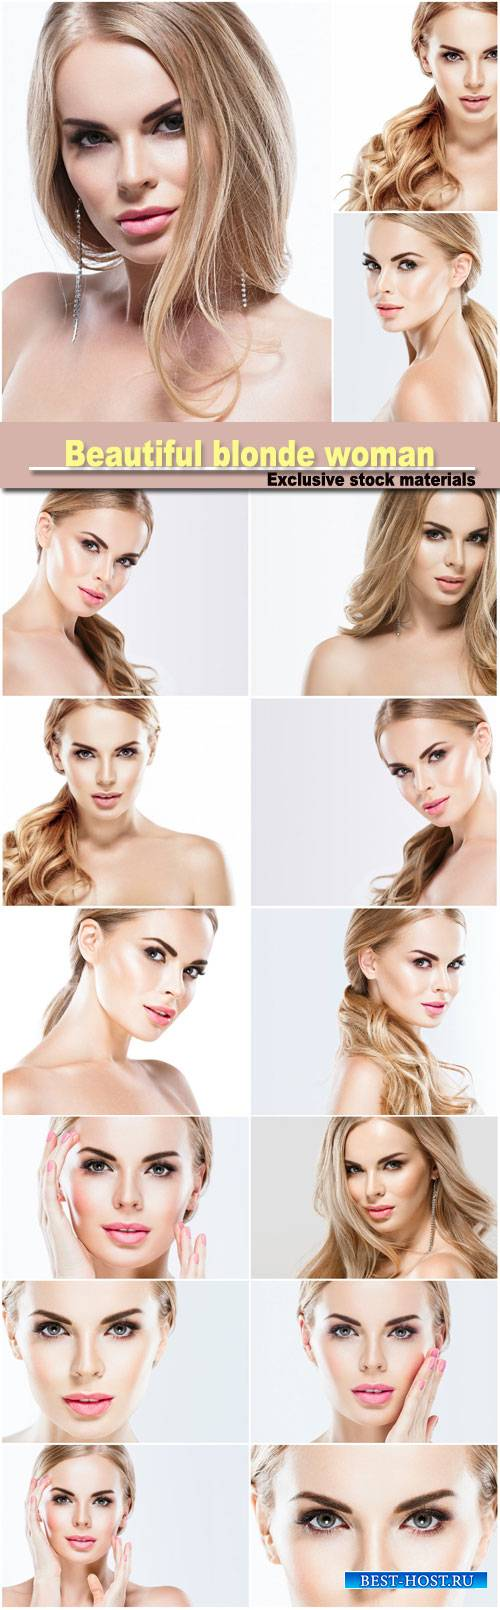 Beautiful blonde woman face close up portrait studio on white